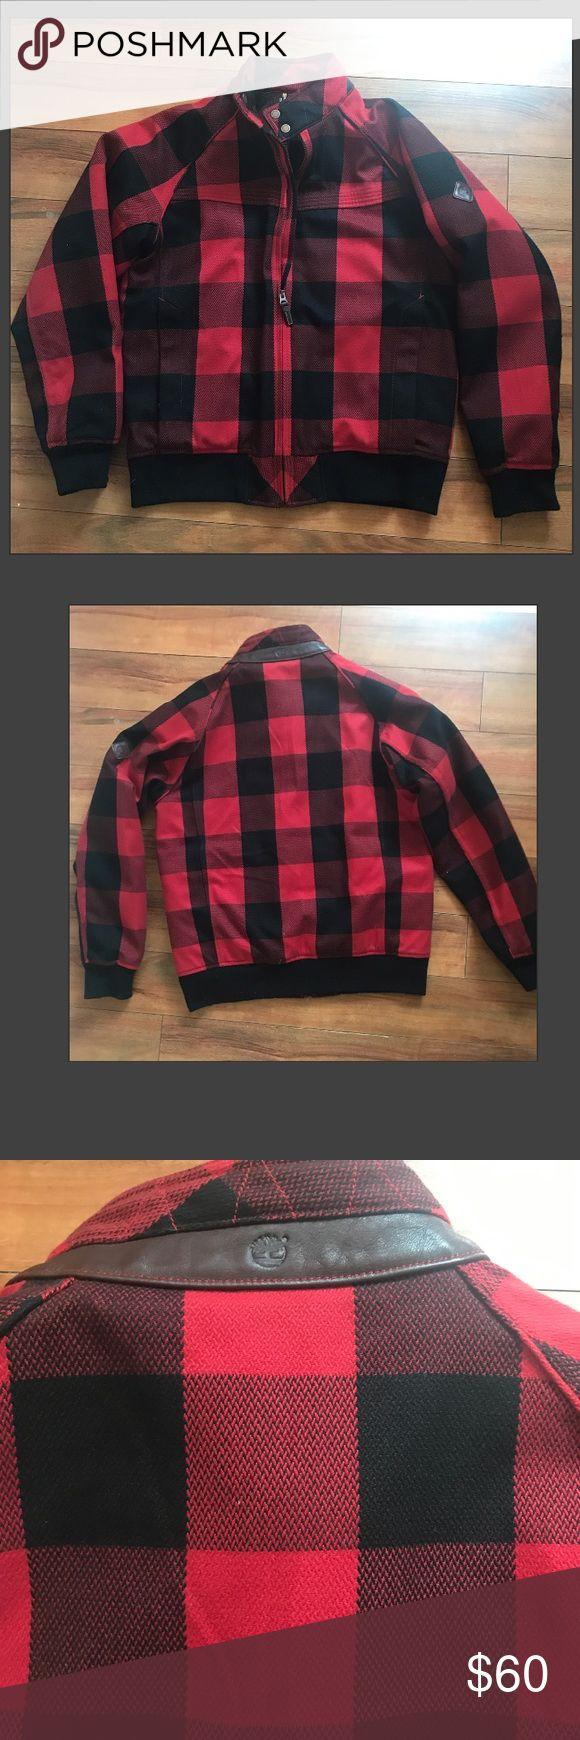 Timberland 🌳 plaid waterproof Jacket Great condition Timberland Jackets & Coats Raincoats